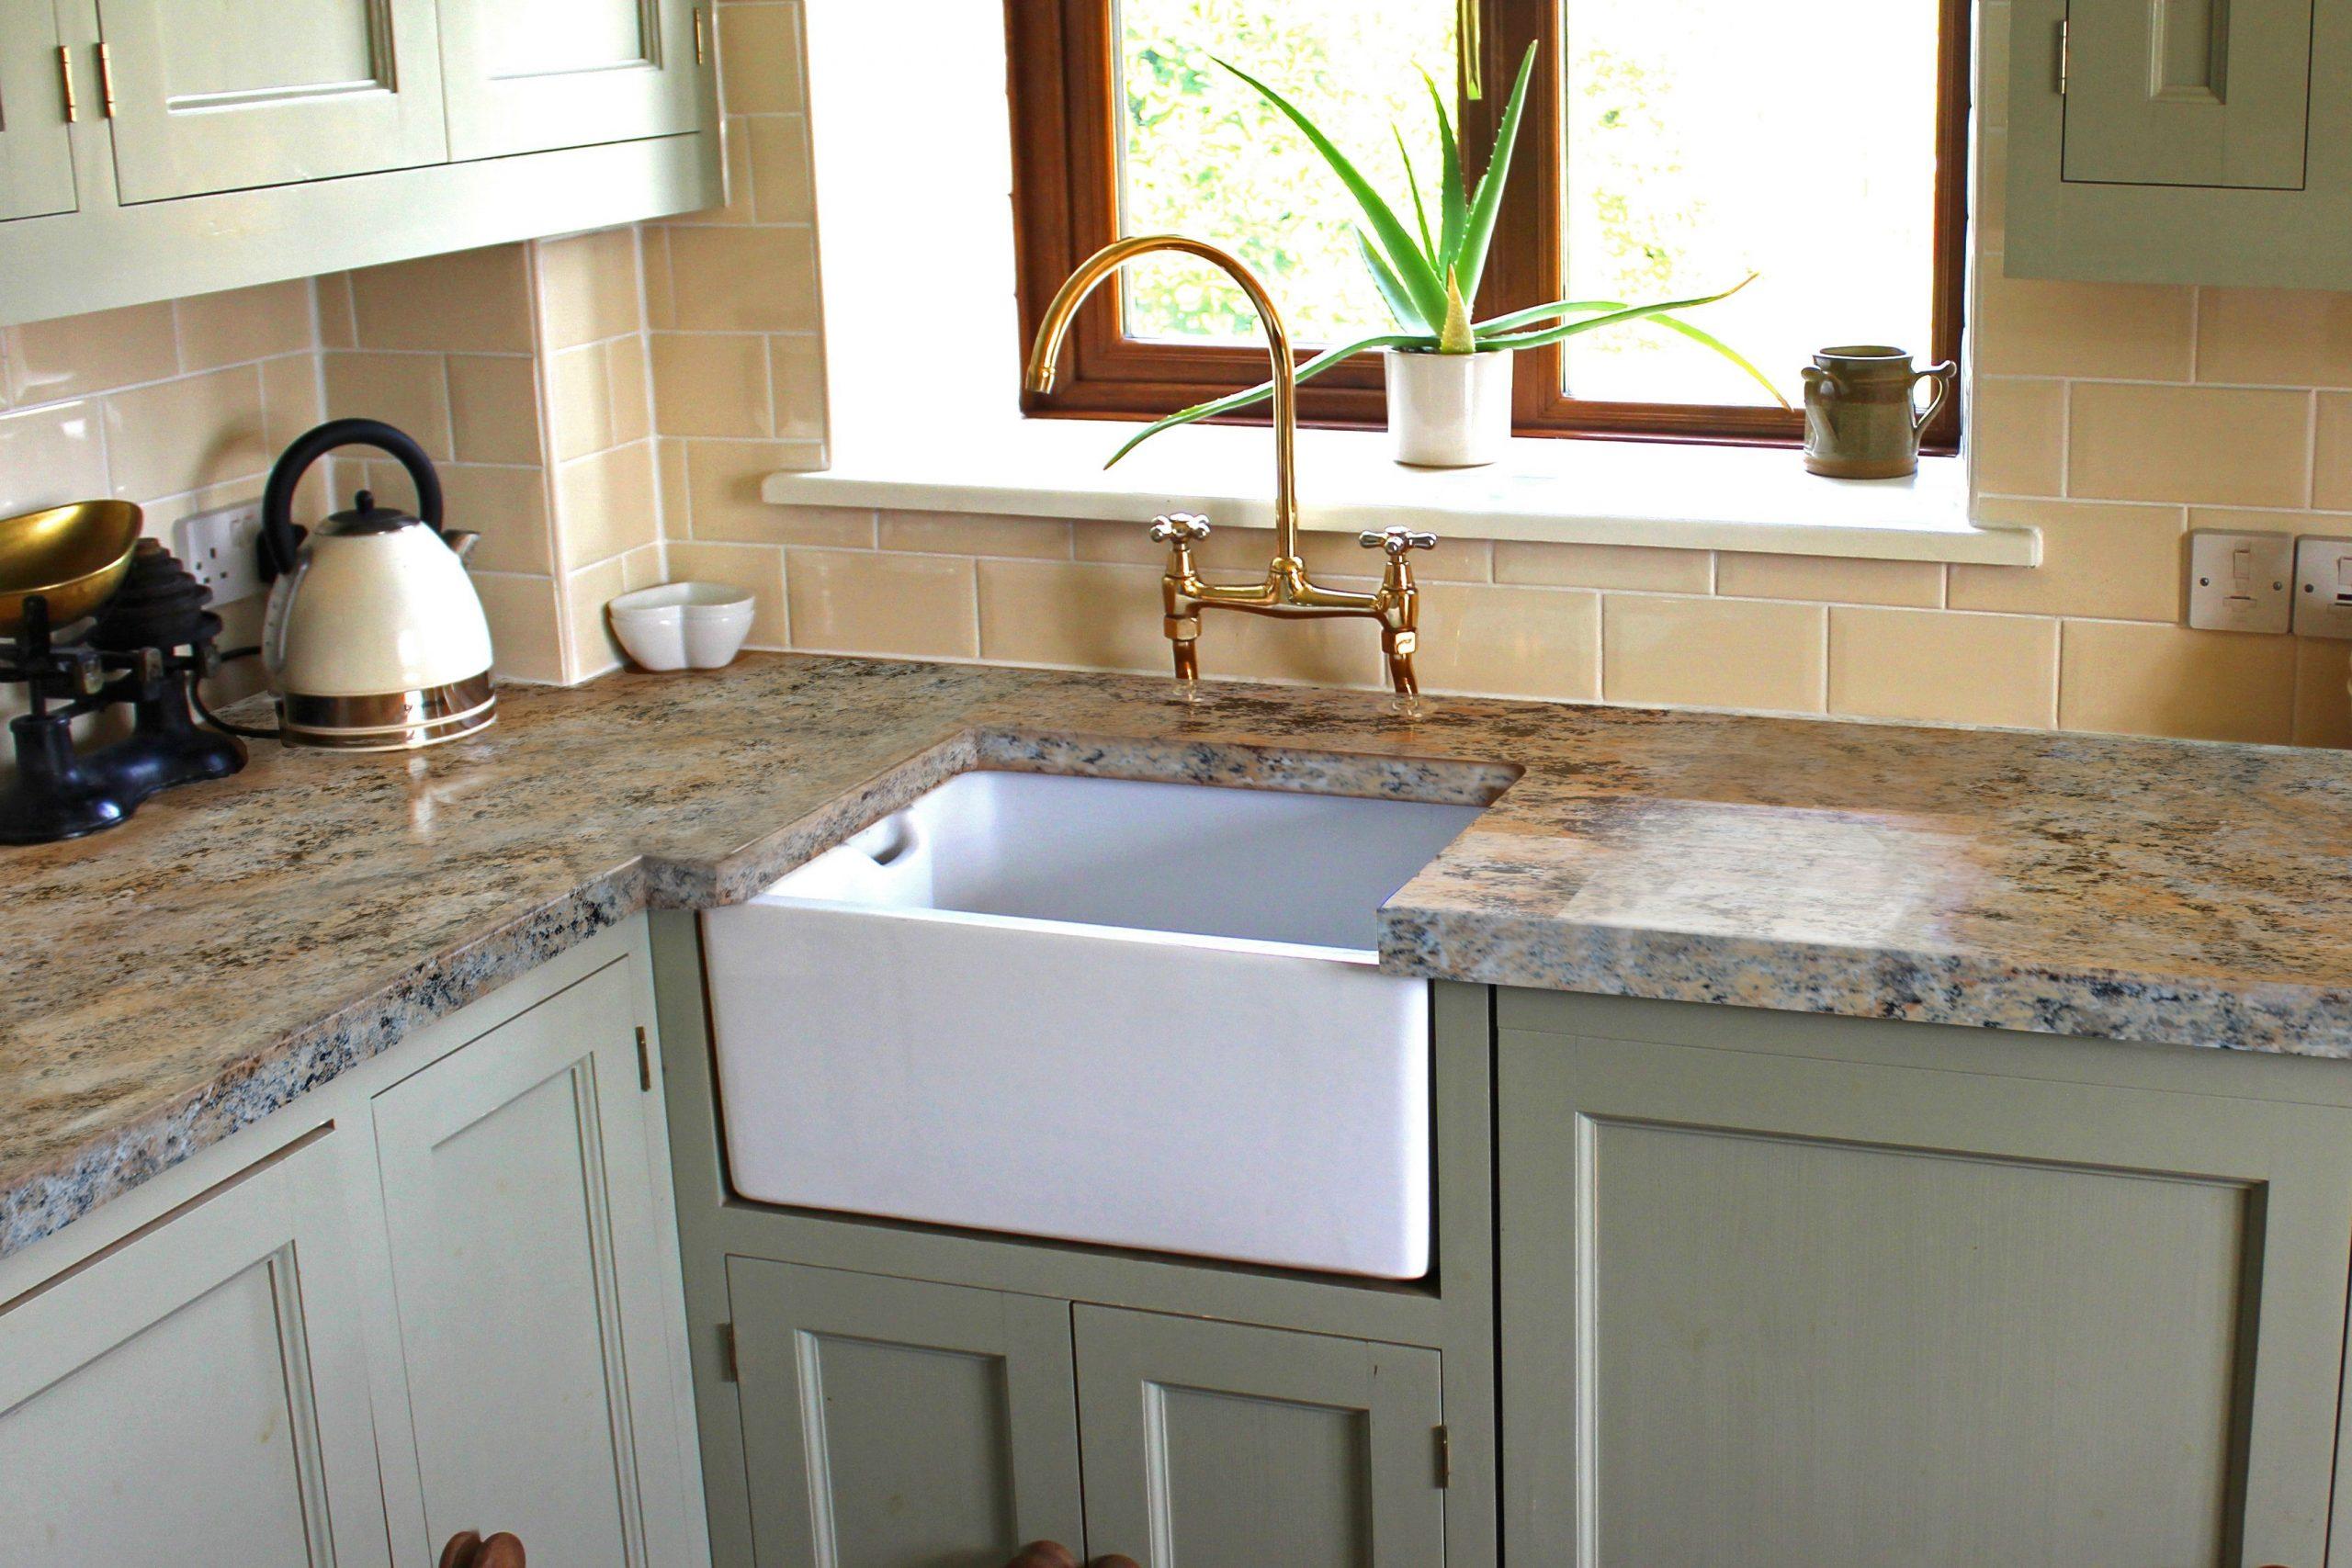 epoxy bathroom countertop kit  The Five Best DIY Countertop Resurfacing Kits - epoxy bathroom countertop kit